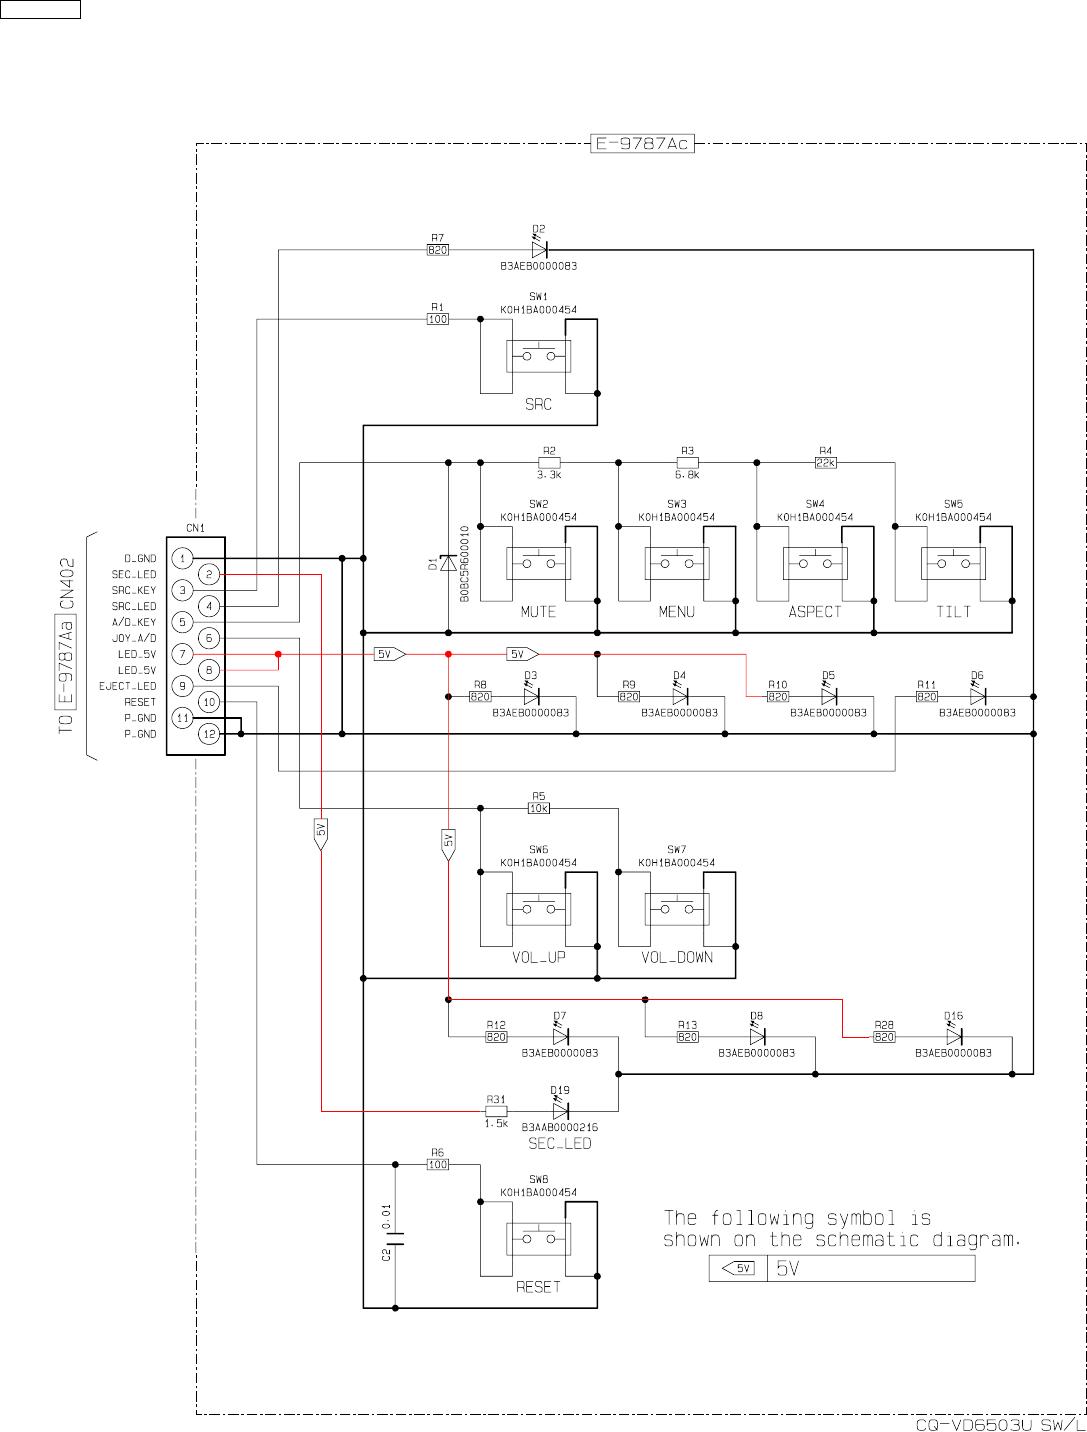 Panasonic Cq Vd6503U Wiring Diagram from usermanual.wiki